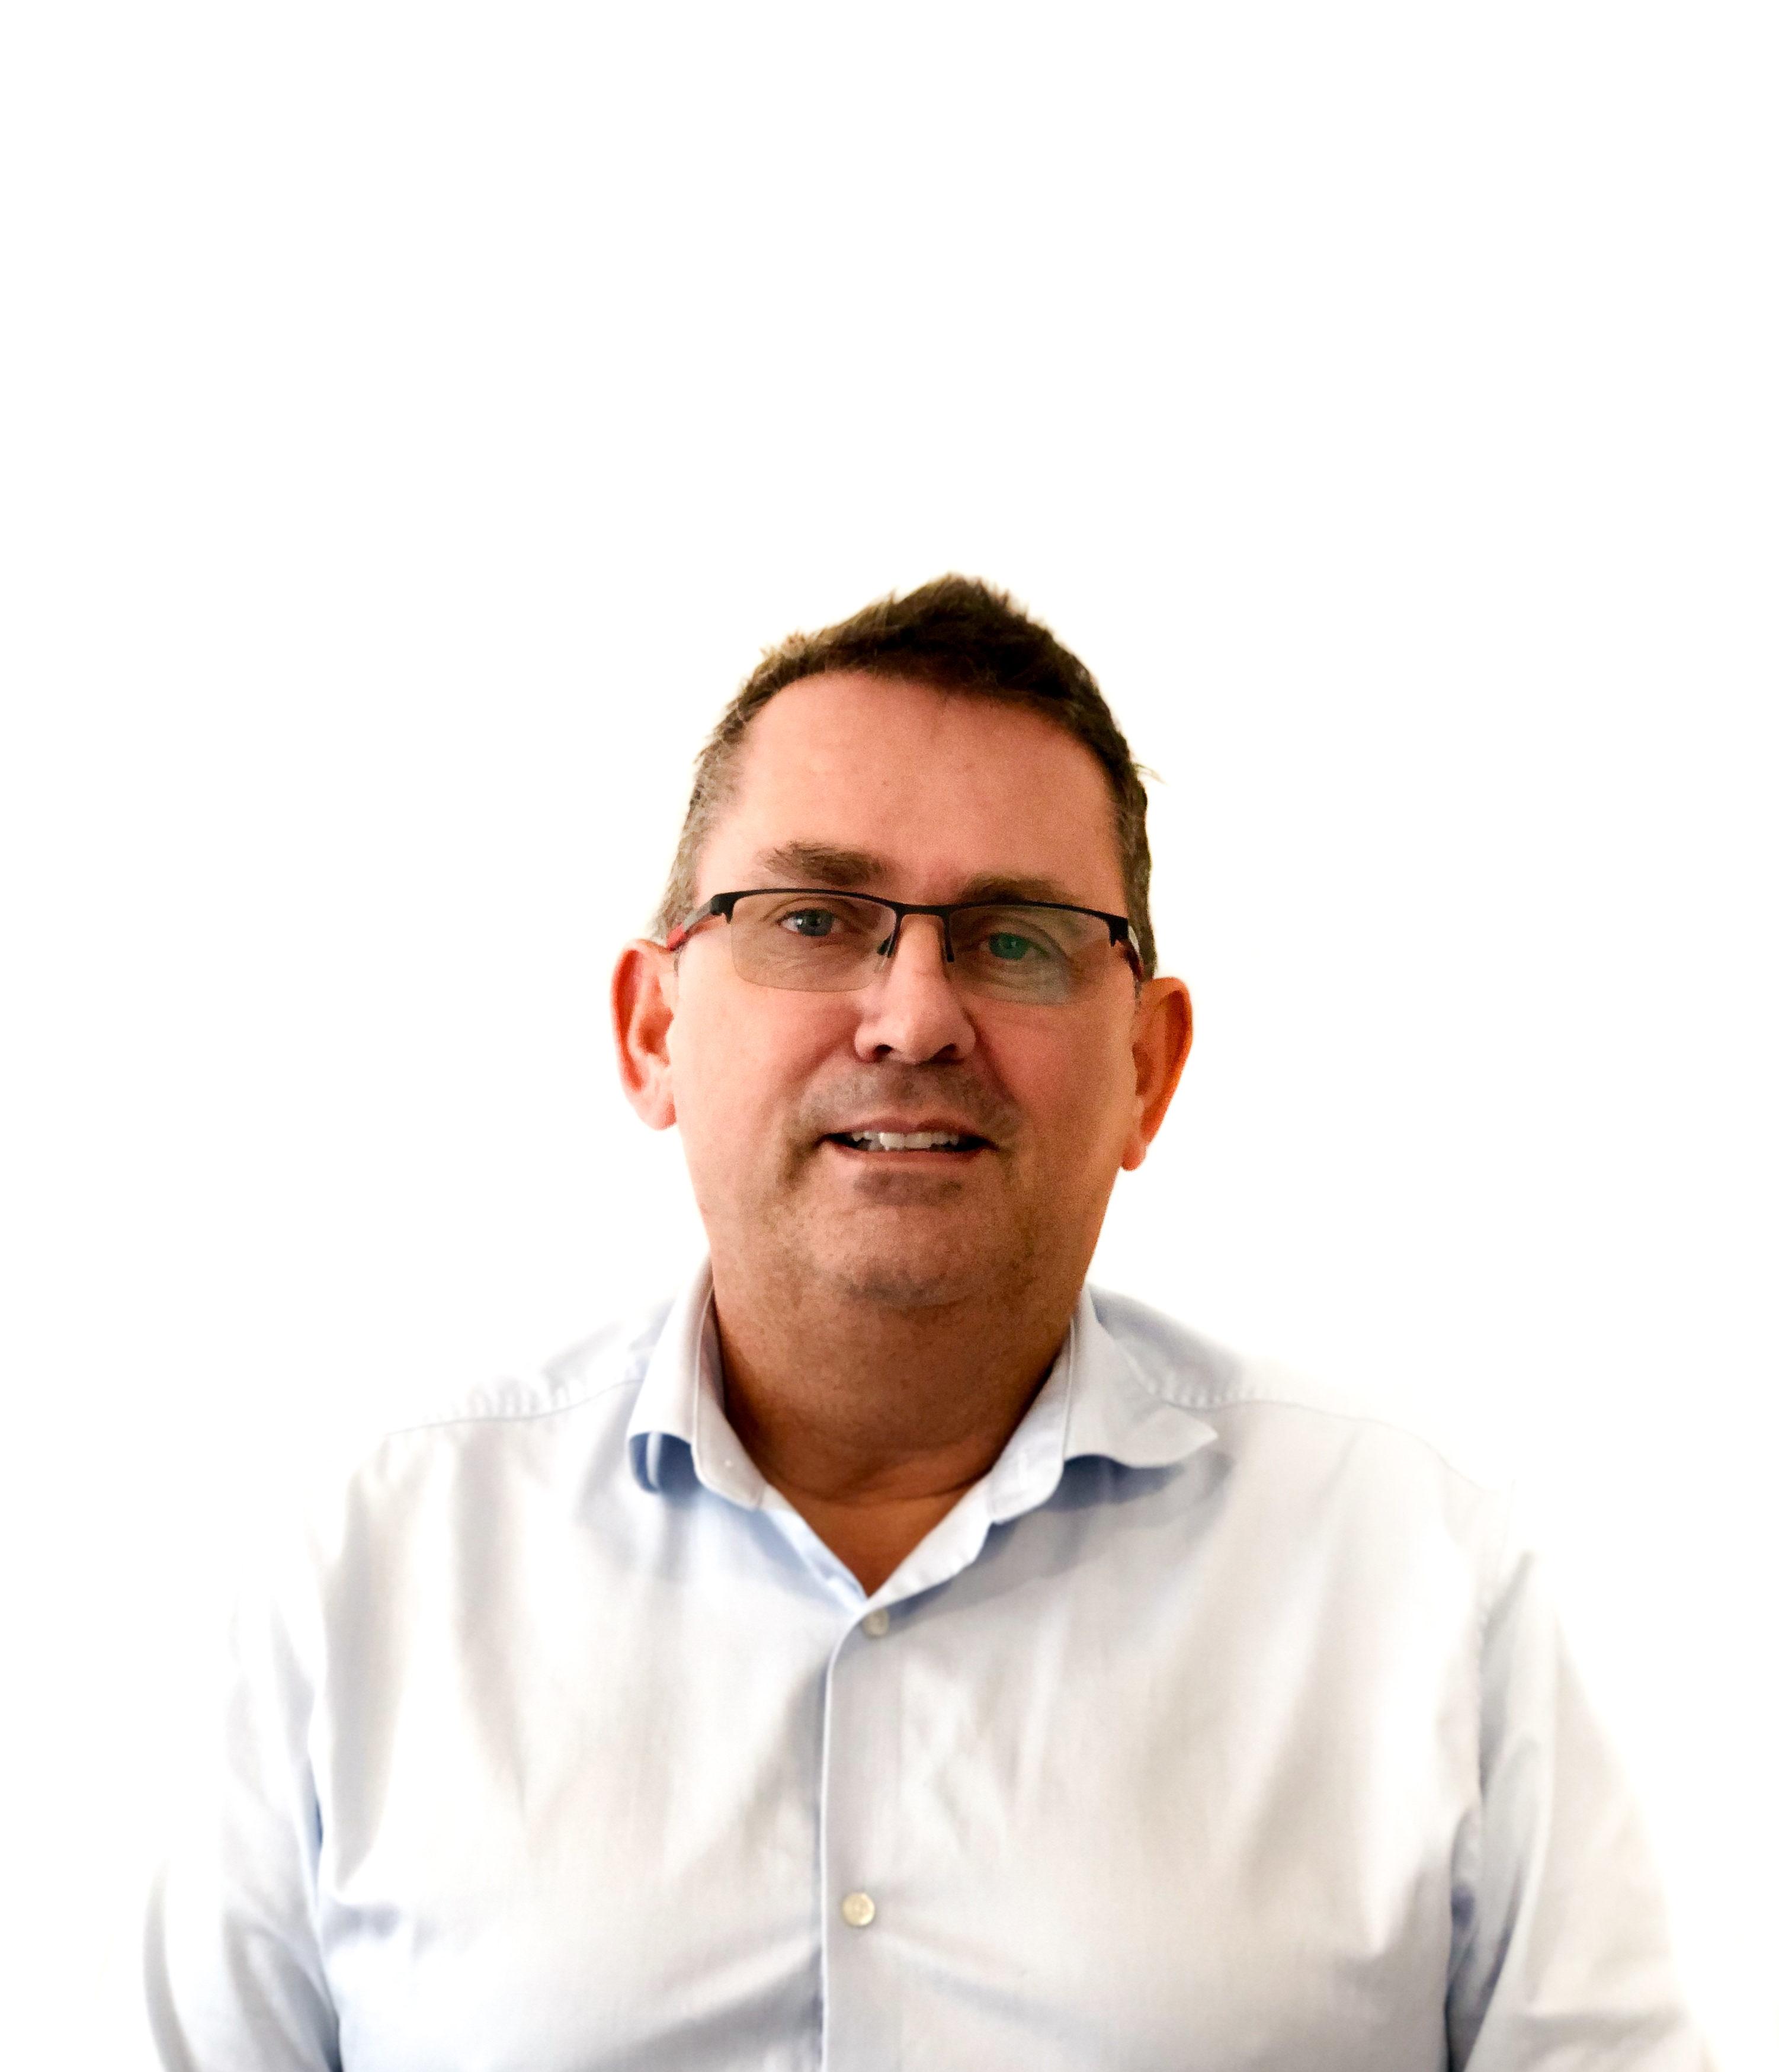 Arild Fjellhaug